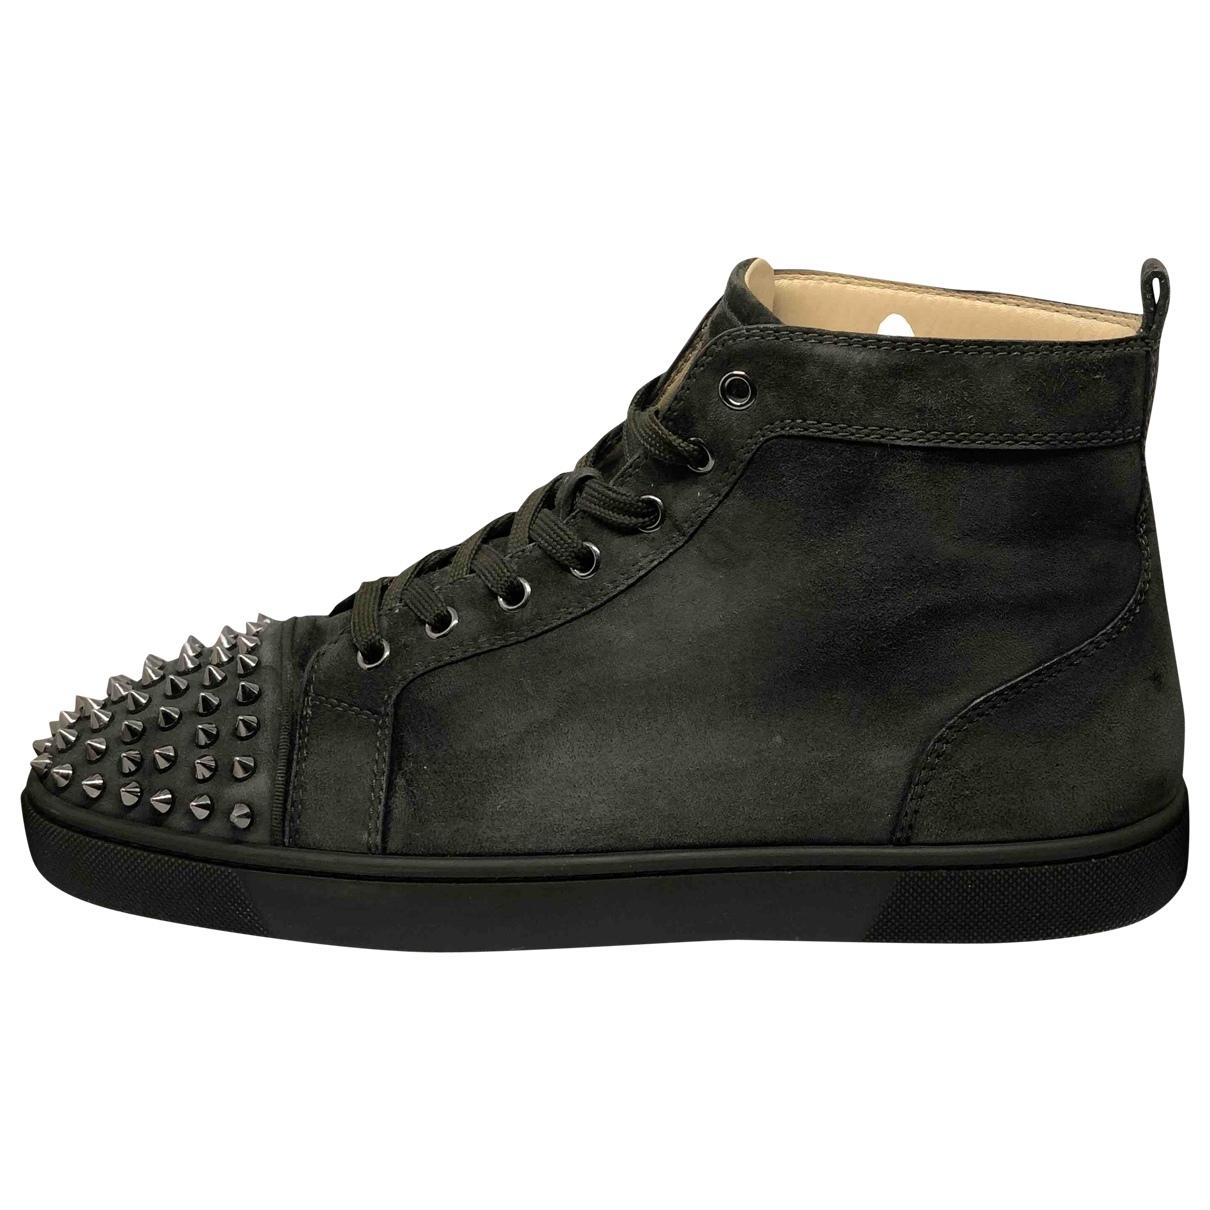 Christian Louboutin Louis Sneakers in  Khaki Veloursleder